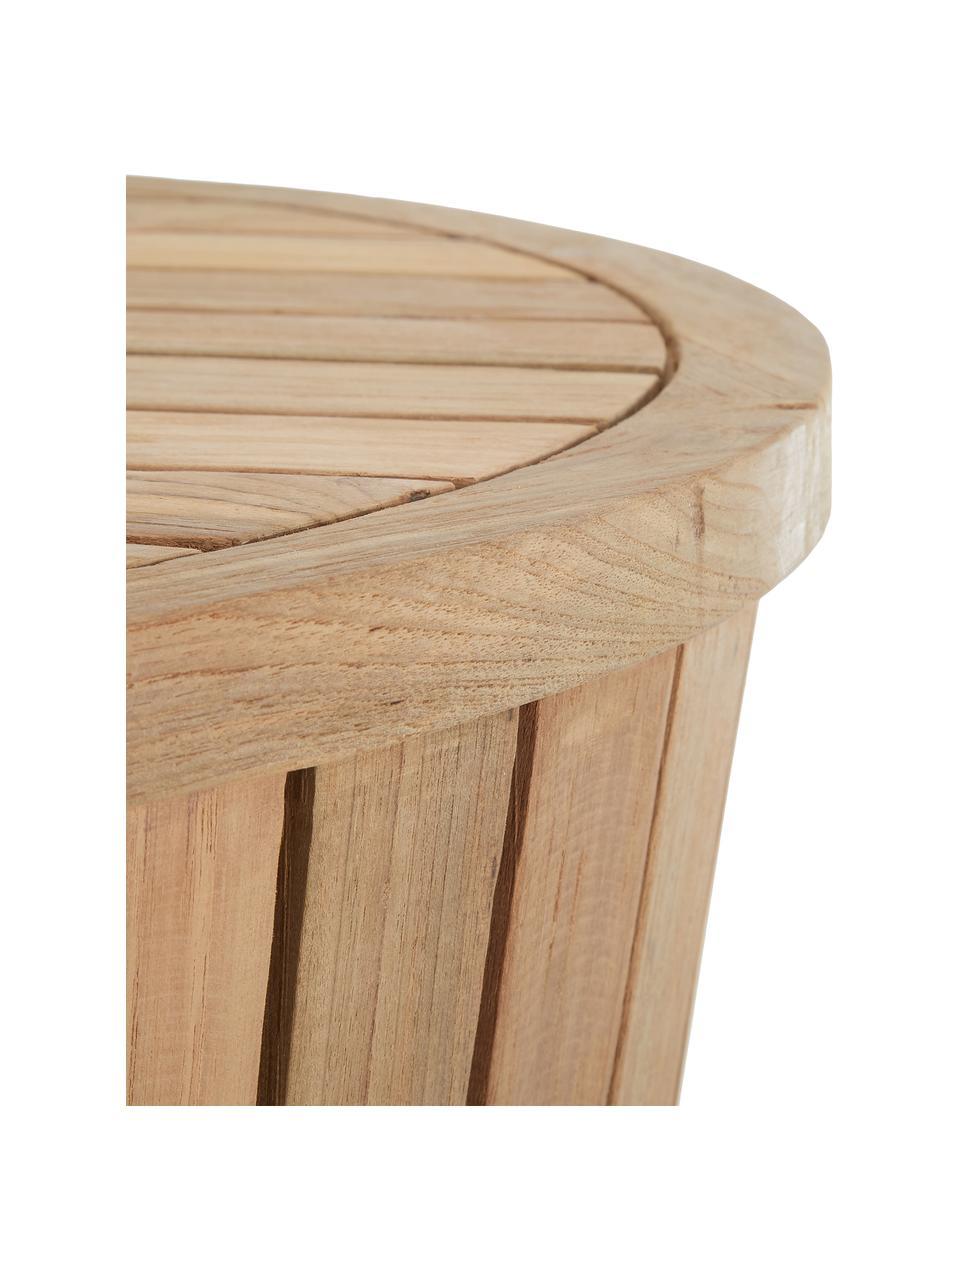 Tavolino rotondo da esterno in teak Circus, Teak riciclato, Legno di teak, Ø 63 x Alt. 43 cm